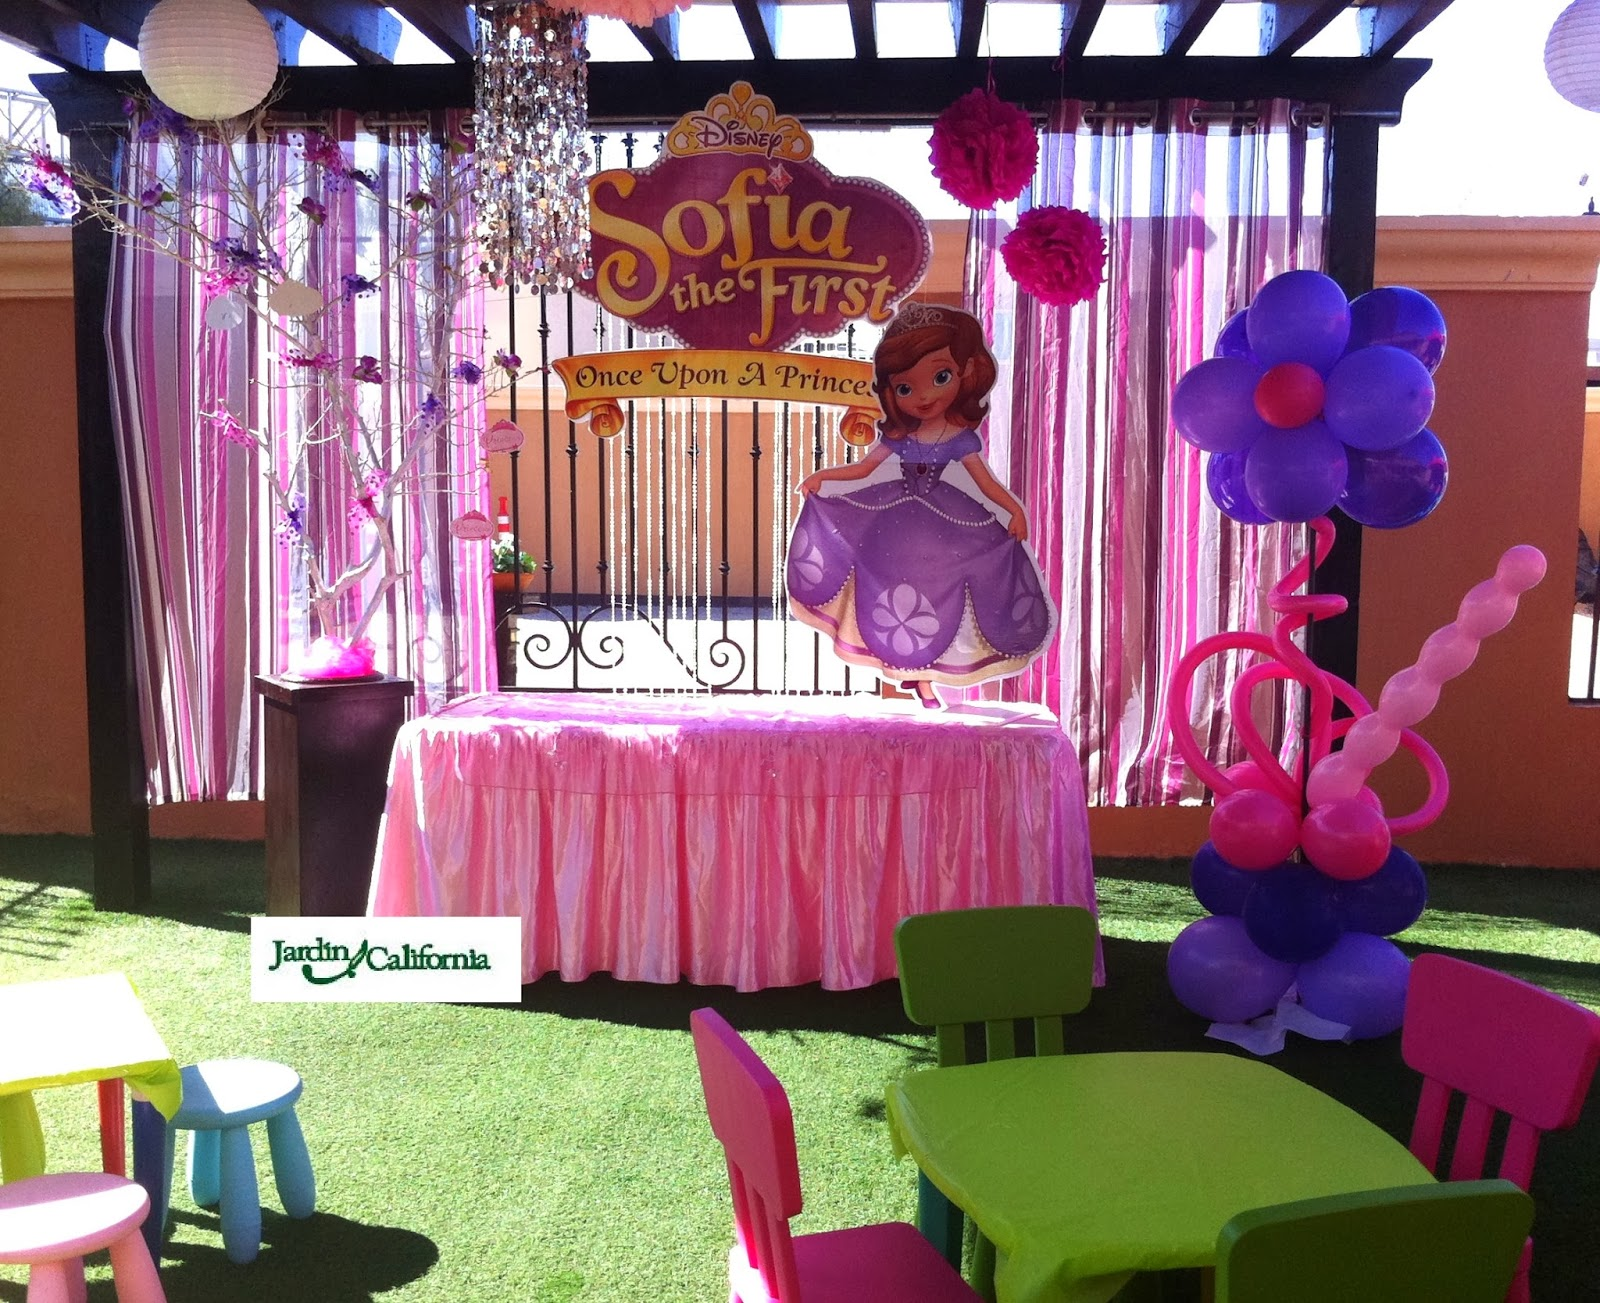 Decoraciónes para fiestas infantiles de princesa safia - Imagui